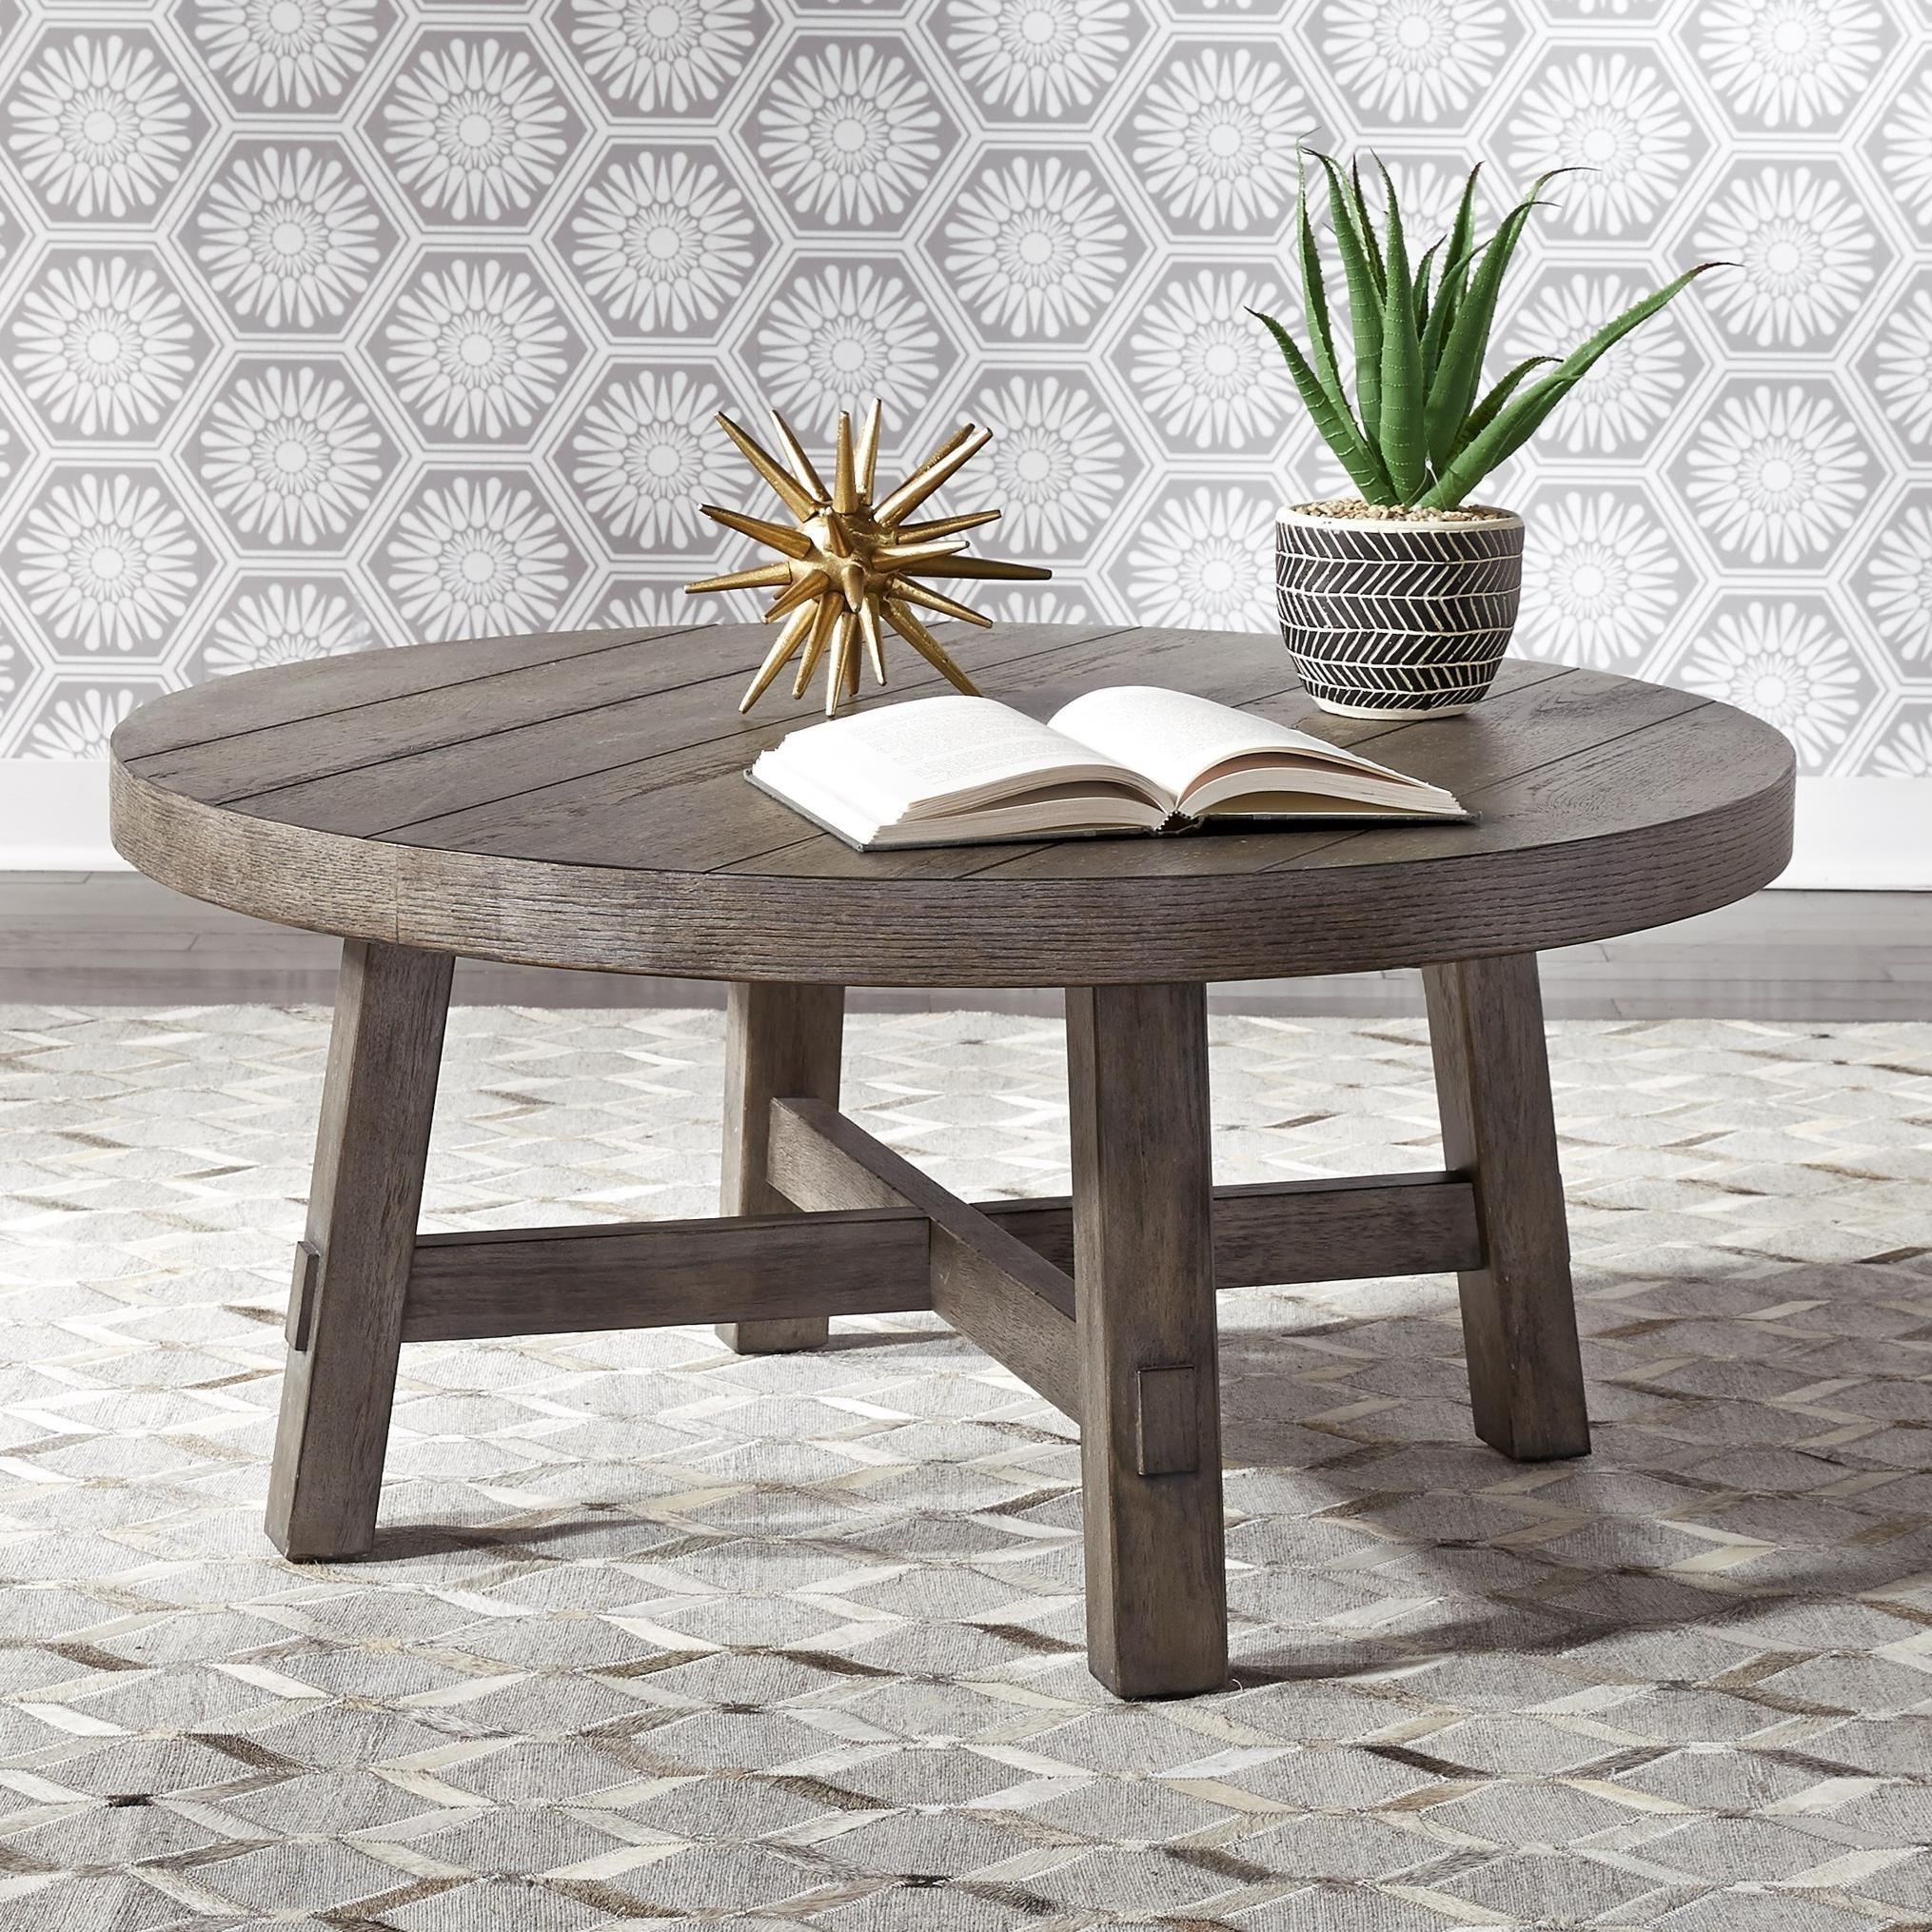 Splay Leg Round Cocktail Table